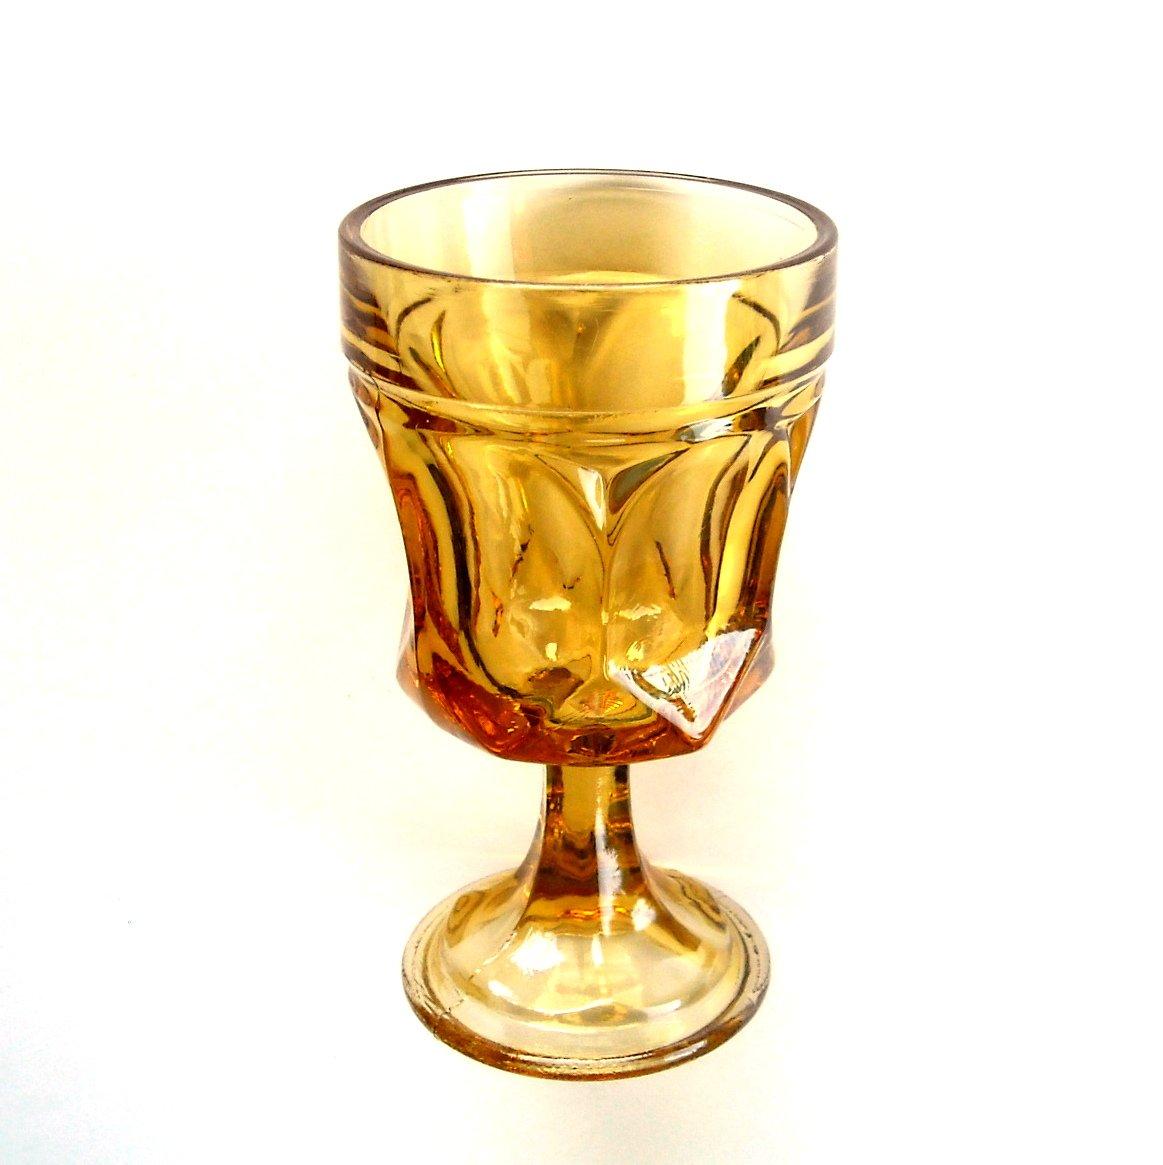 Vintage Anchor Hocking Fairfield Honey Amber Glass Goblet